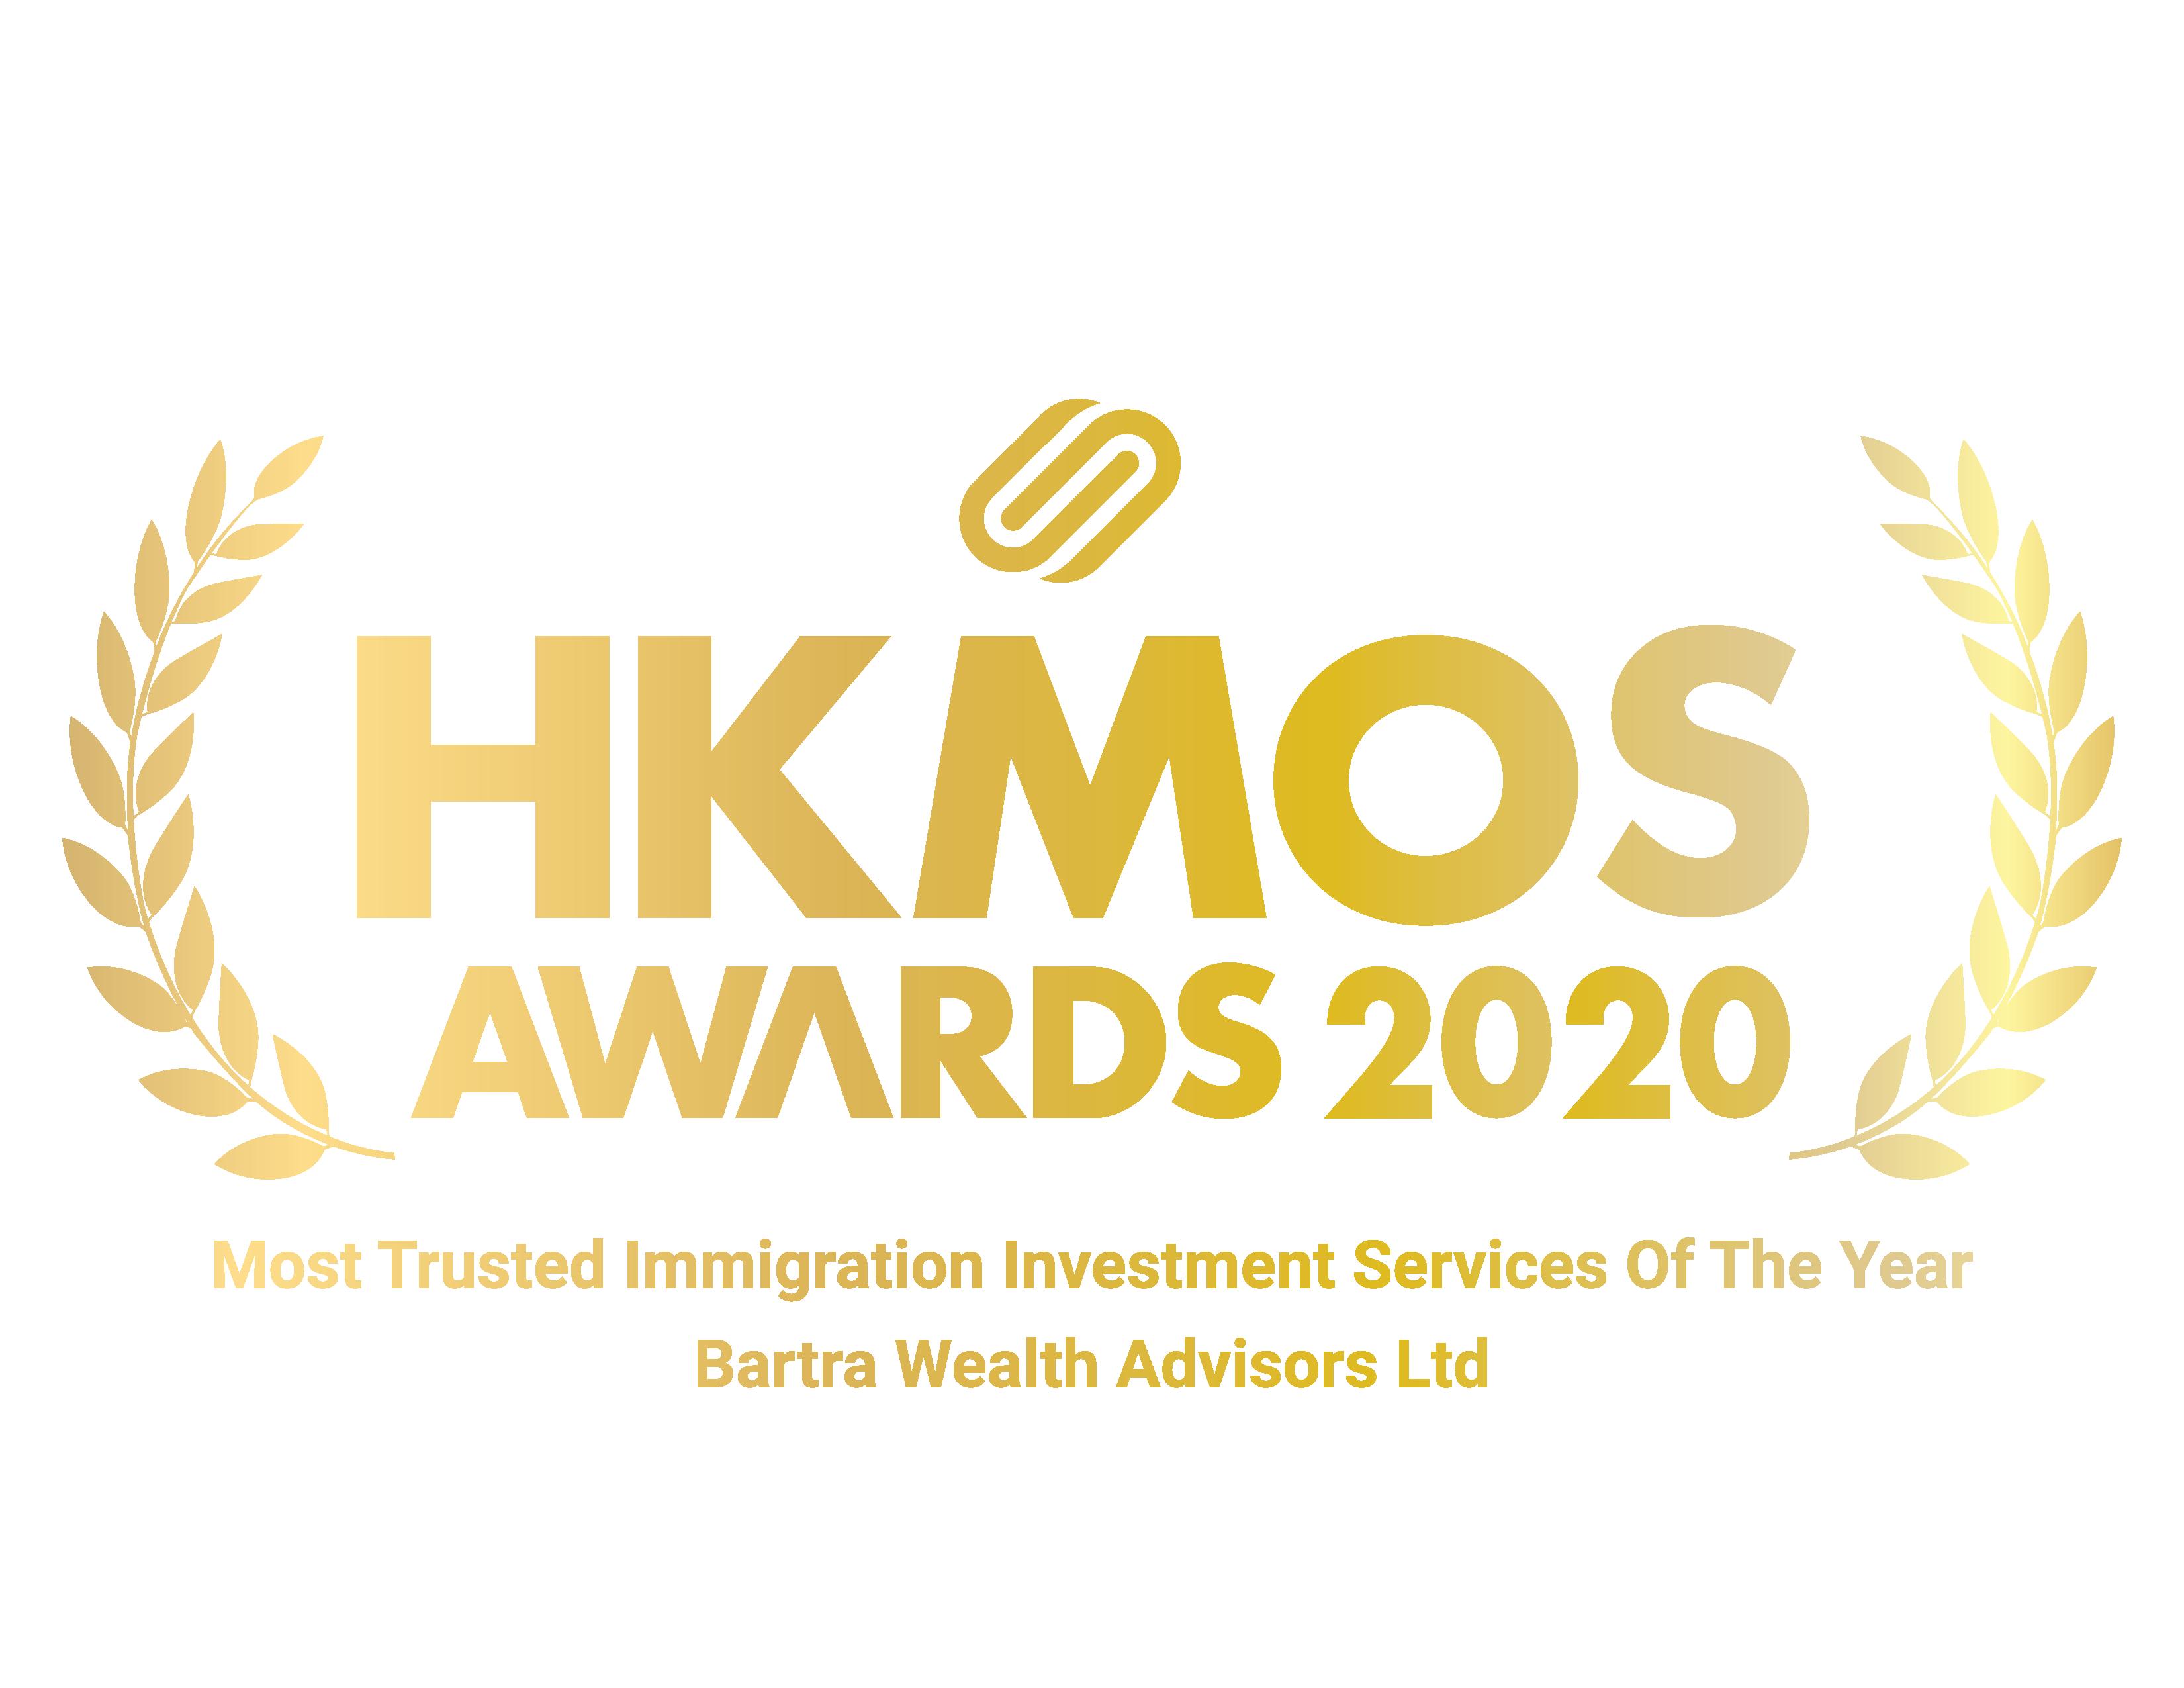 HKMOS2020